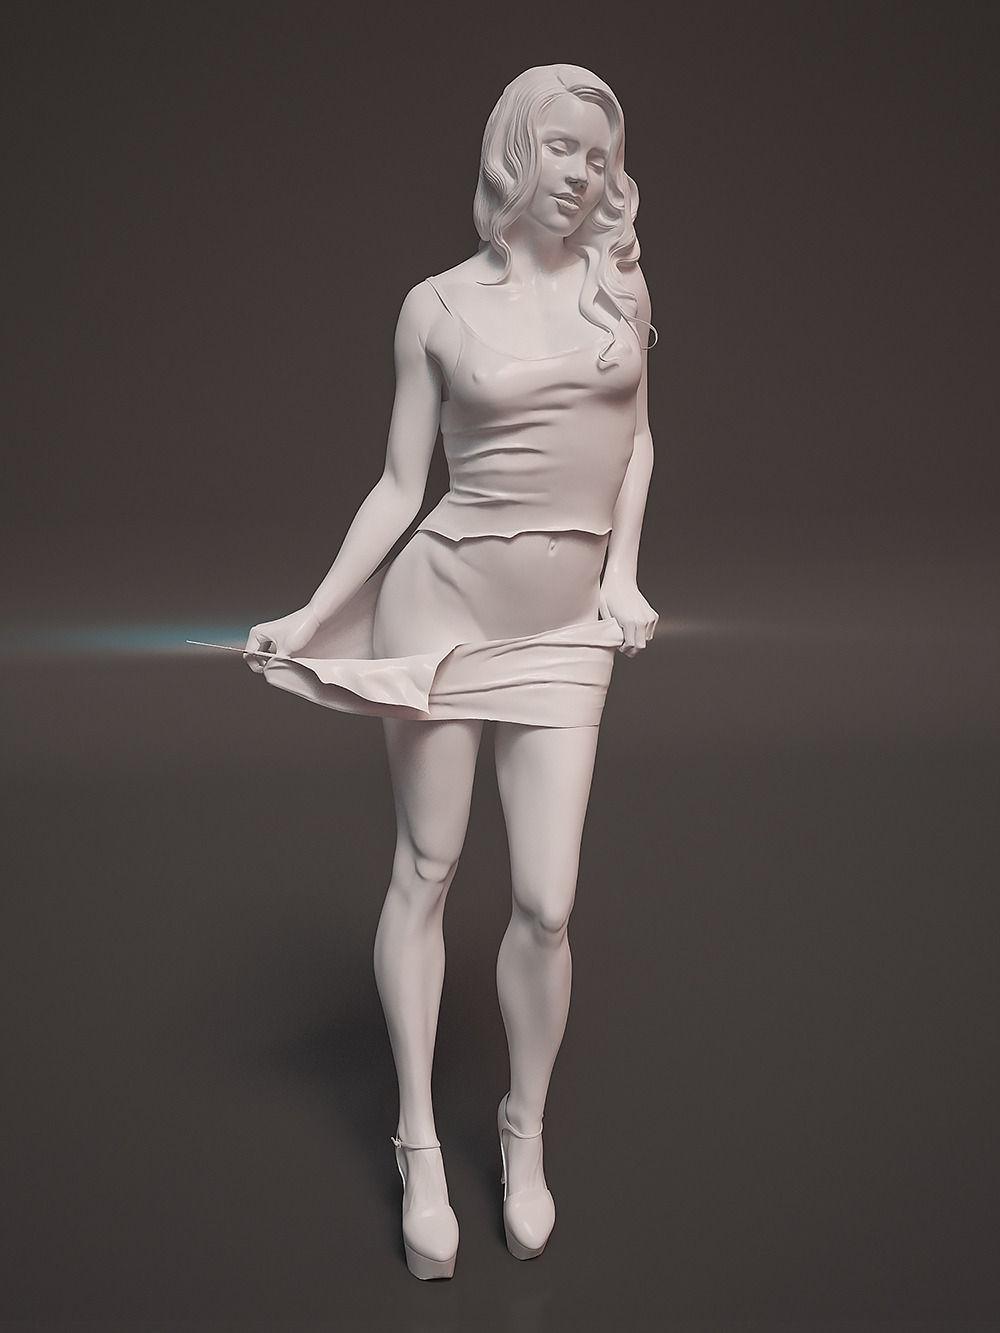 Hd Great White Shark Wallpaper Sculpture Girl 3d Model 3d Printable Stl Cgtrader Com